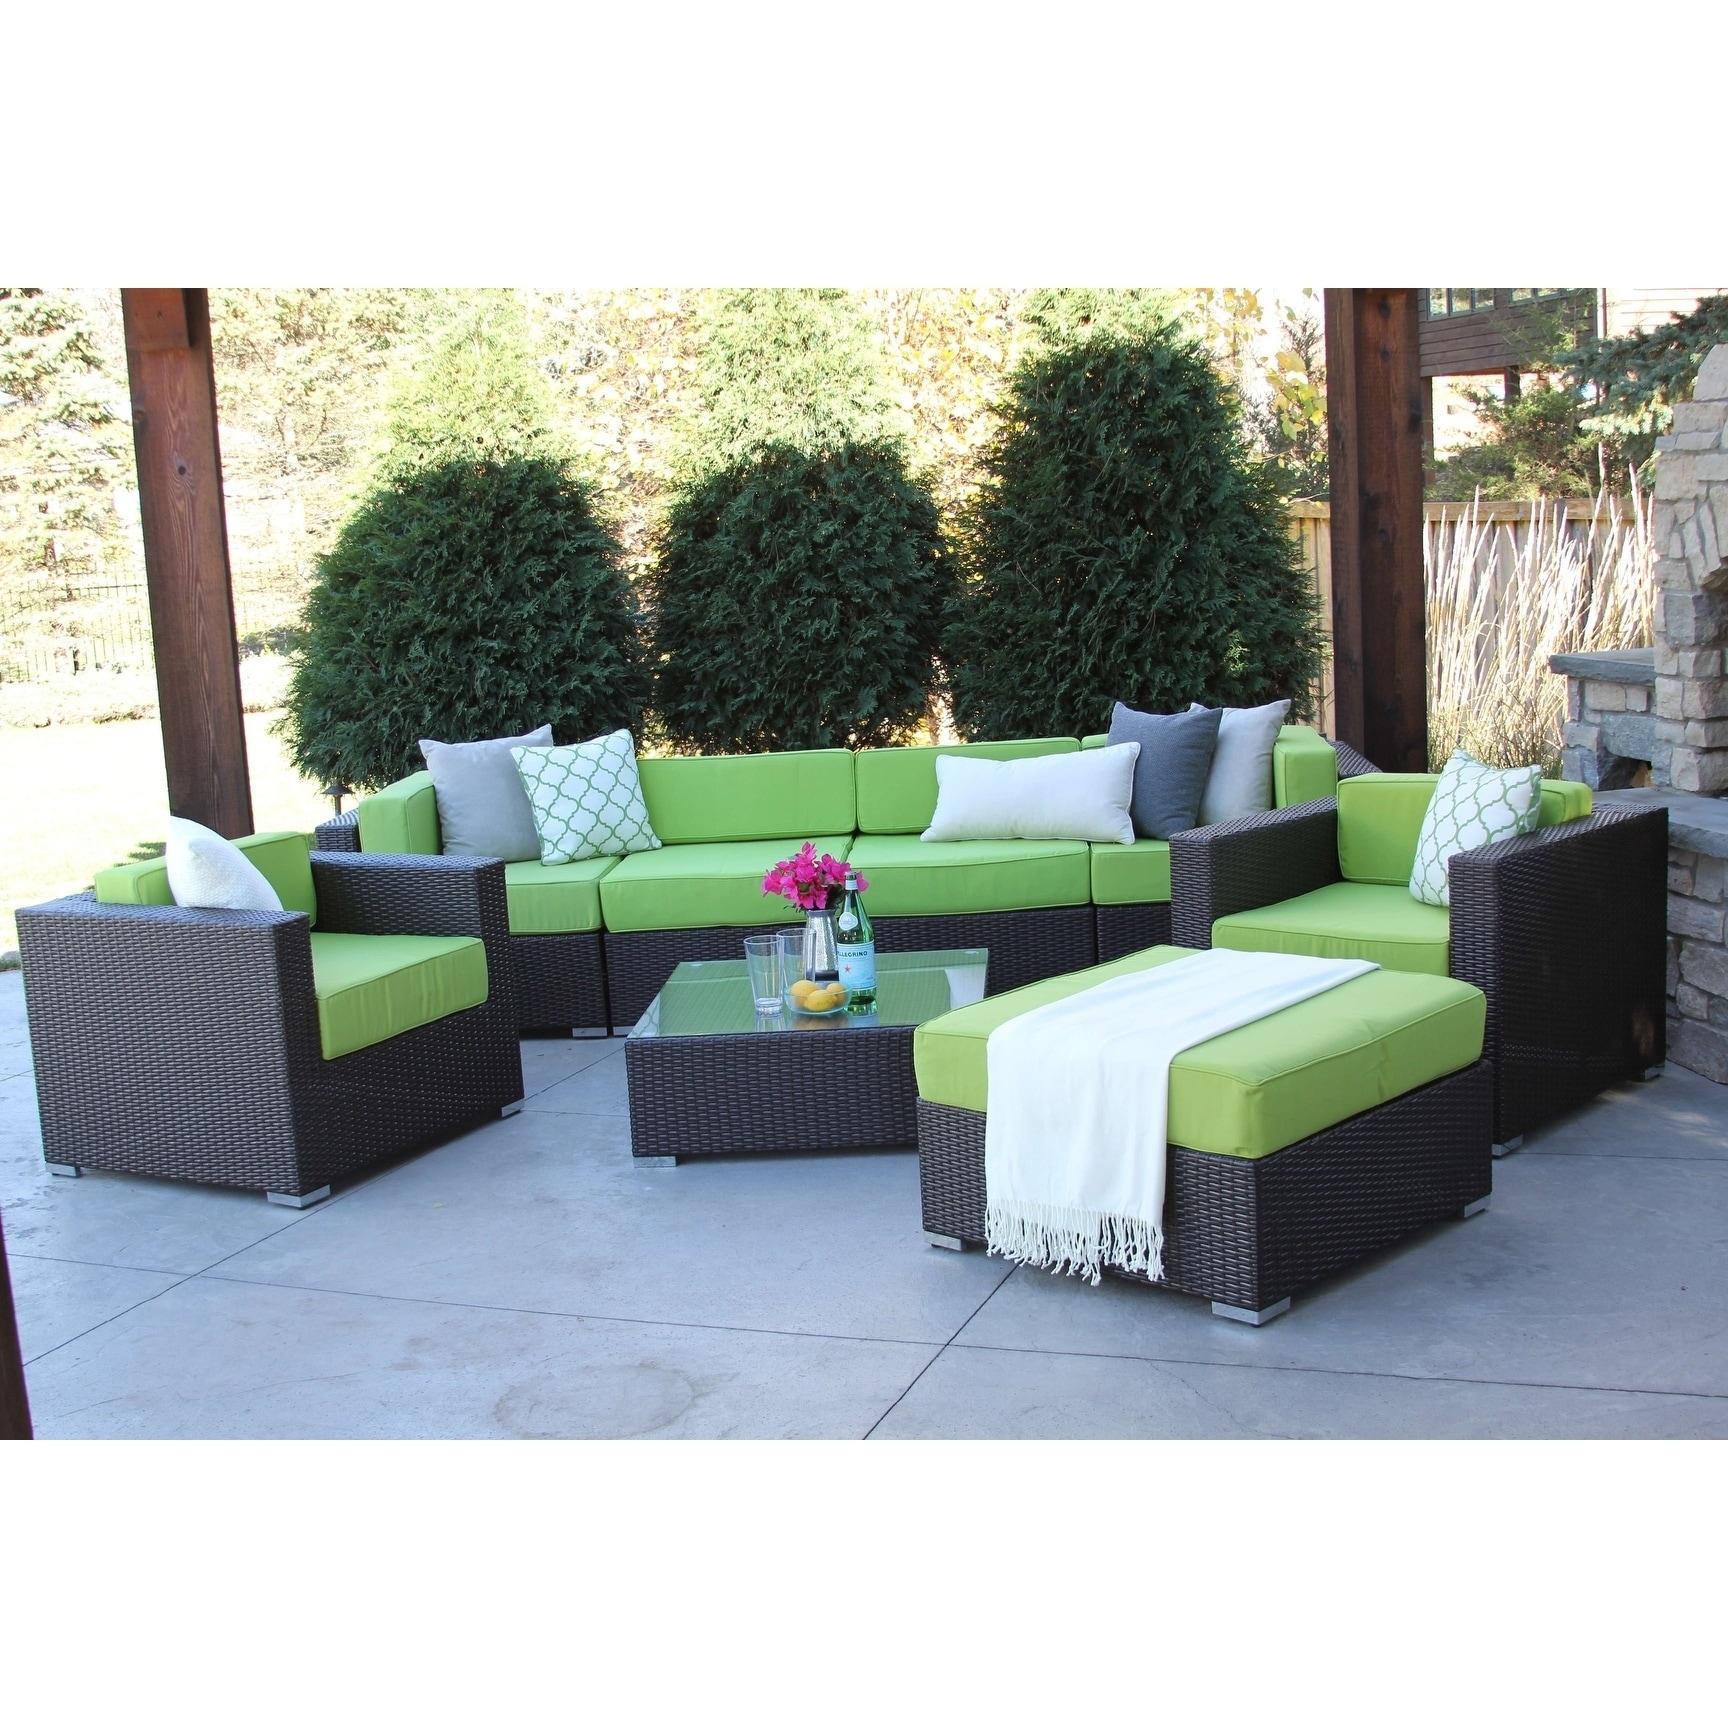 Hiawatha 8PC Modern Outdoor Rattan Patio Furniture Sofa SetModular